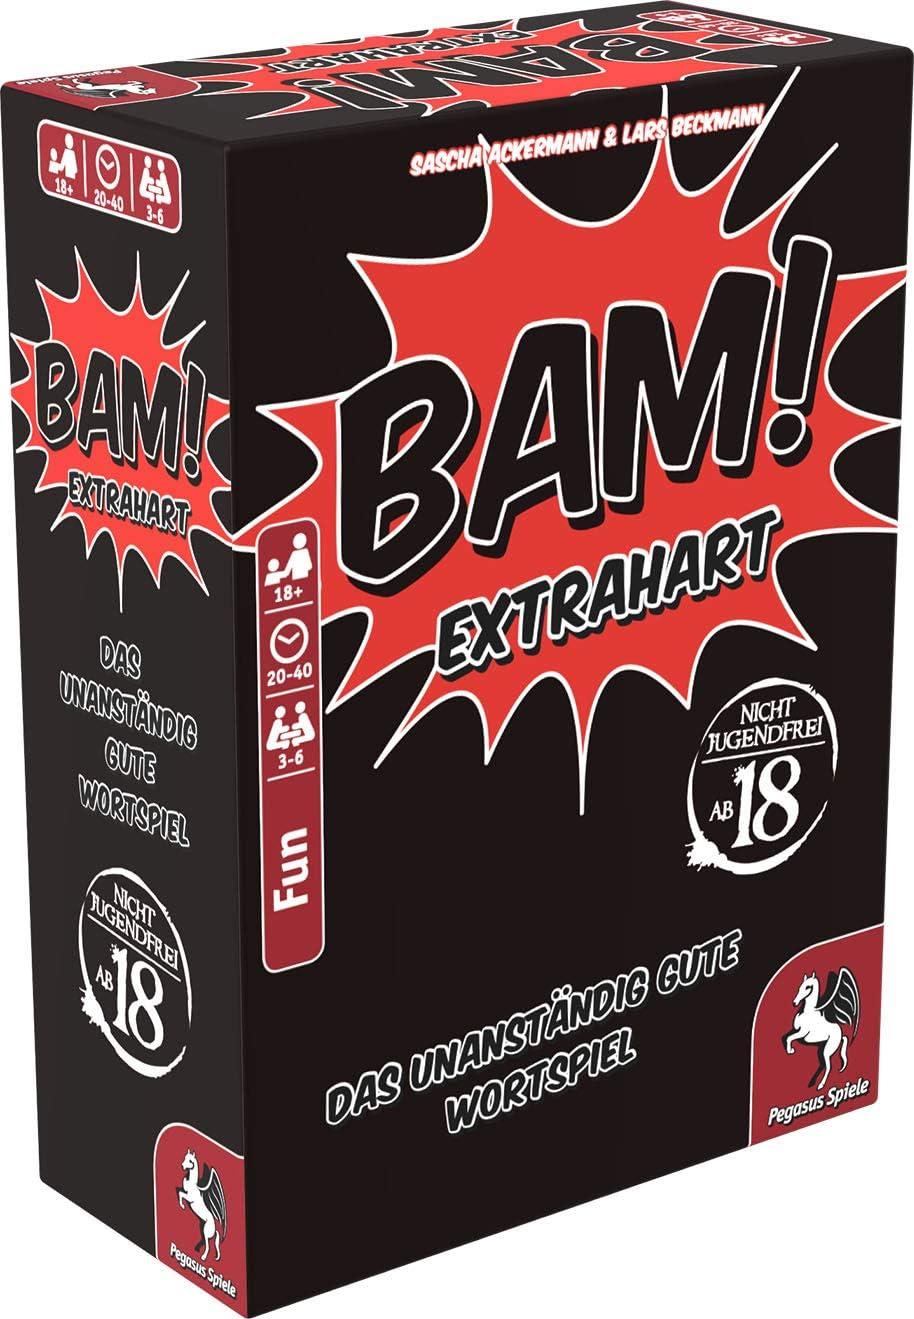 Pegasus Spiele BAM! - Extrahart: Amazon.de: Spielzeug -